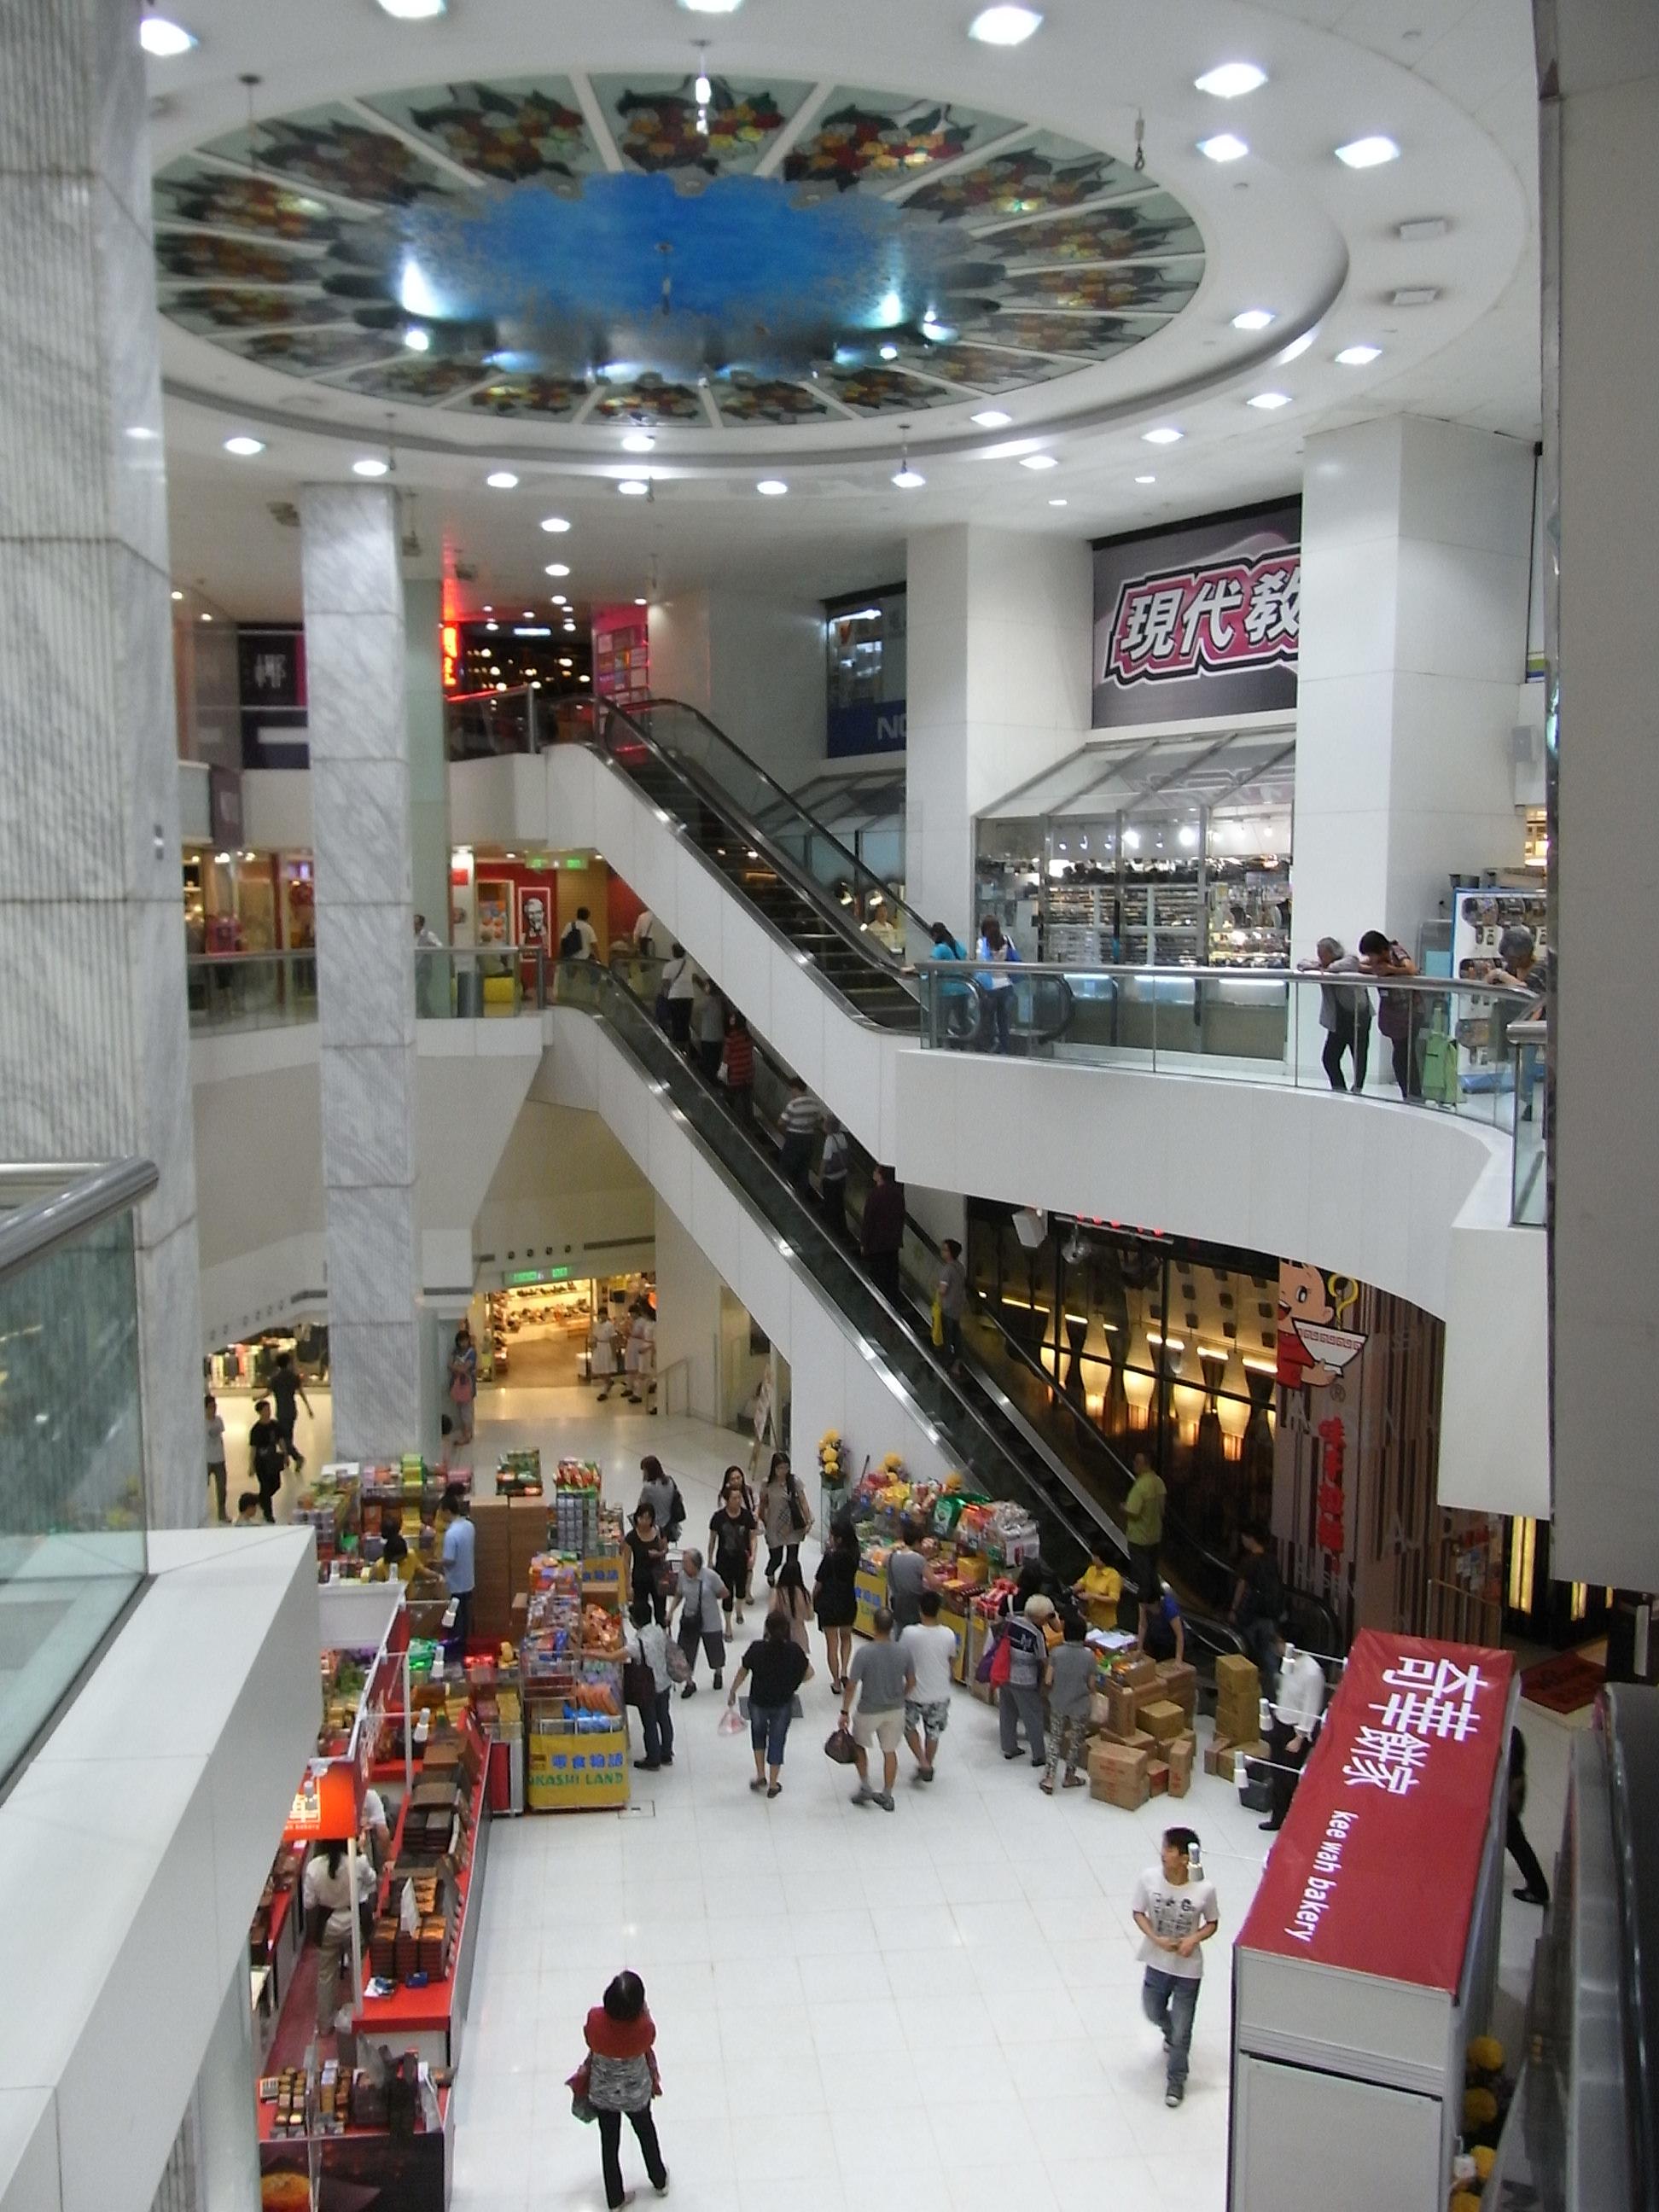 File:HK Chai Wan New Jade Gardens Shopping Arcade Interior Courtyard  Visitors Sep 2012